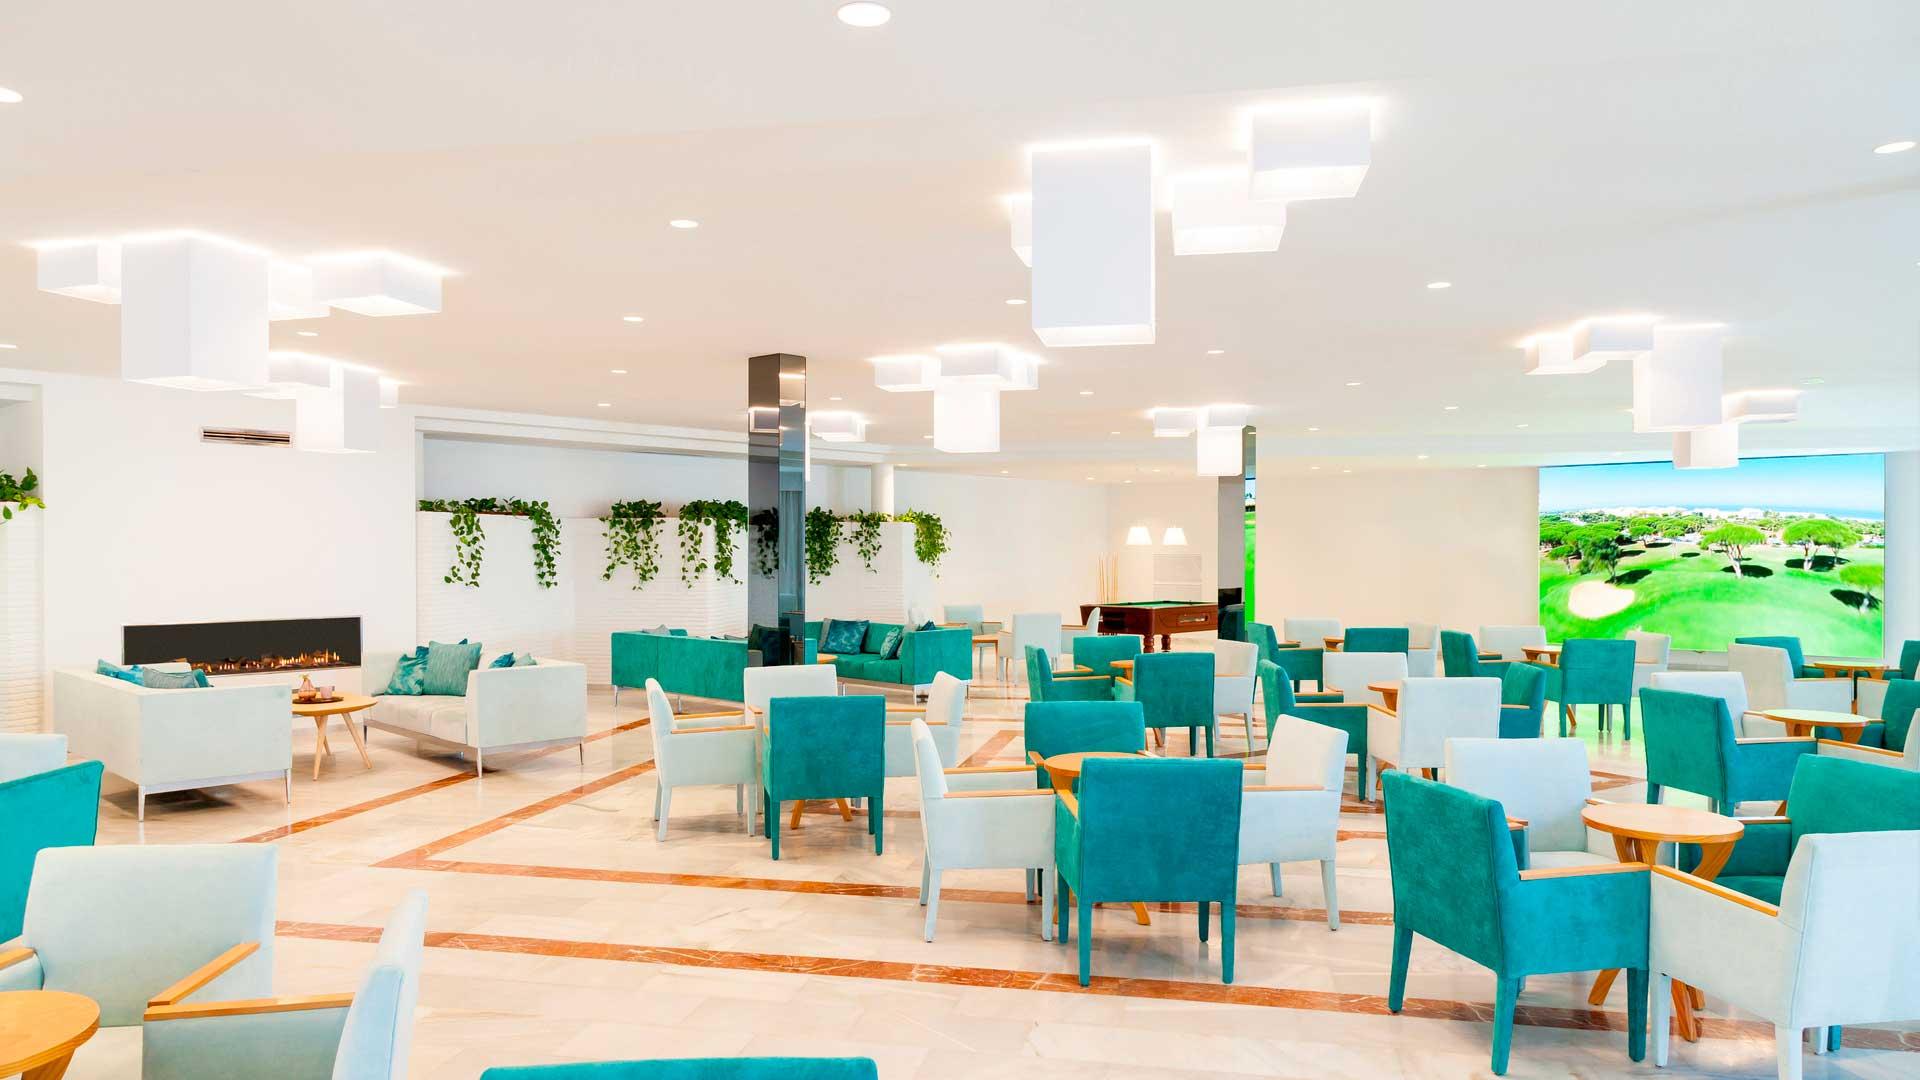 Mobiliario aportado al Hotel Iberostar Royal Alandalus